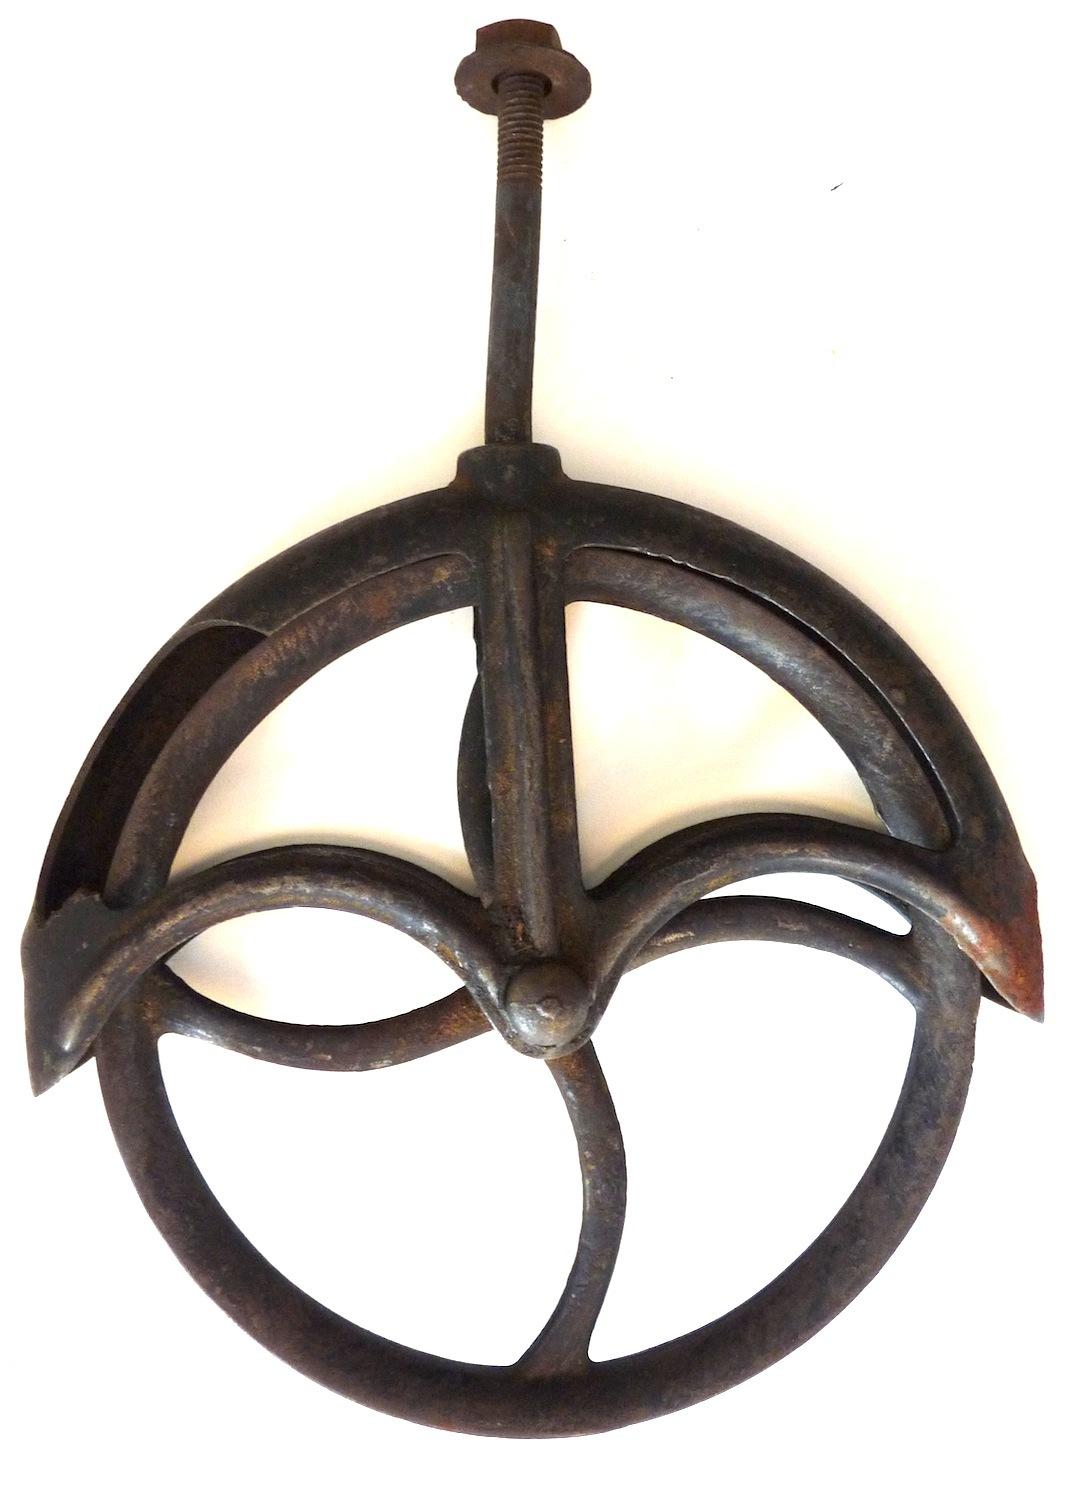 Antique vintage cast iron pulley wheel farm industrial ...